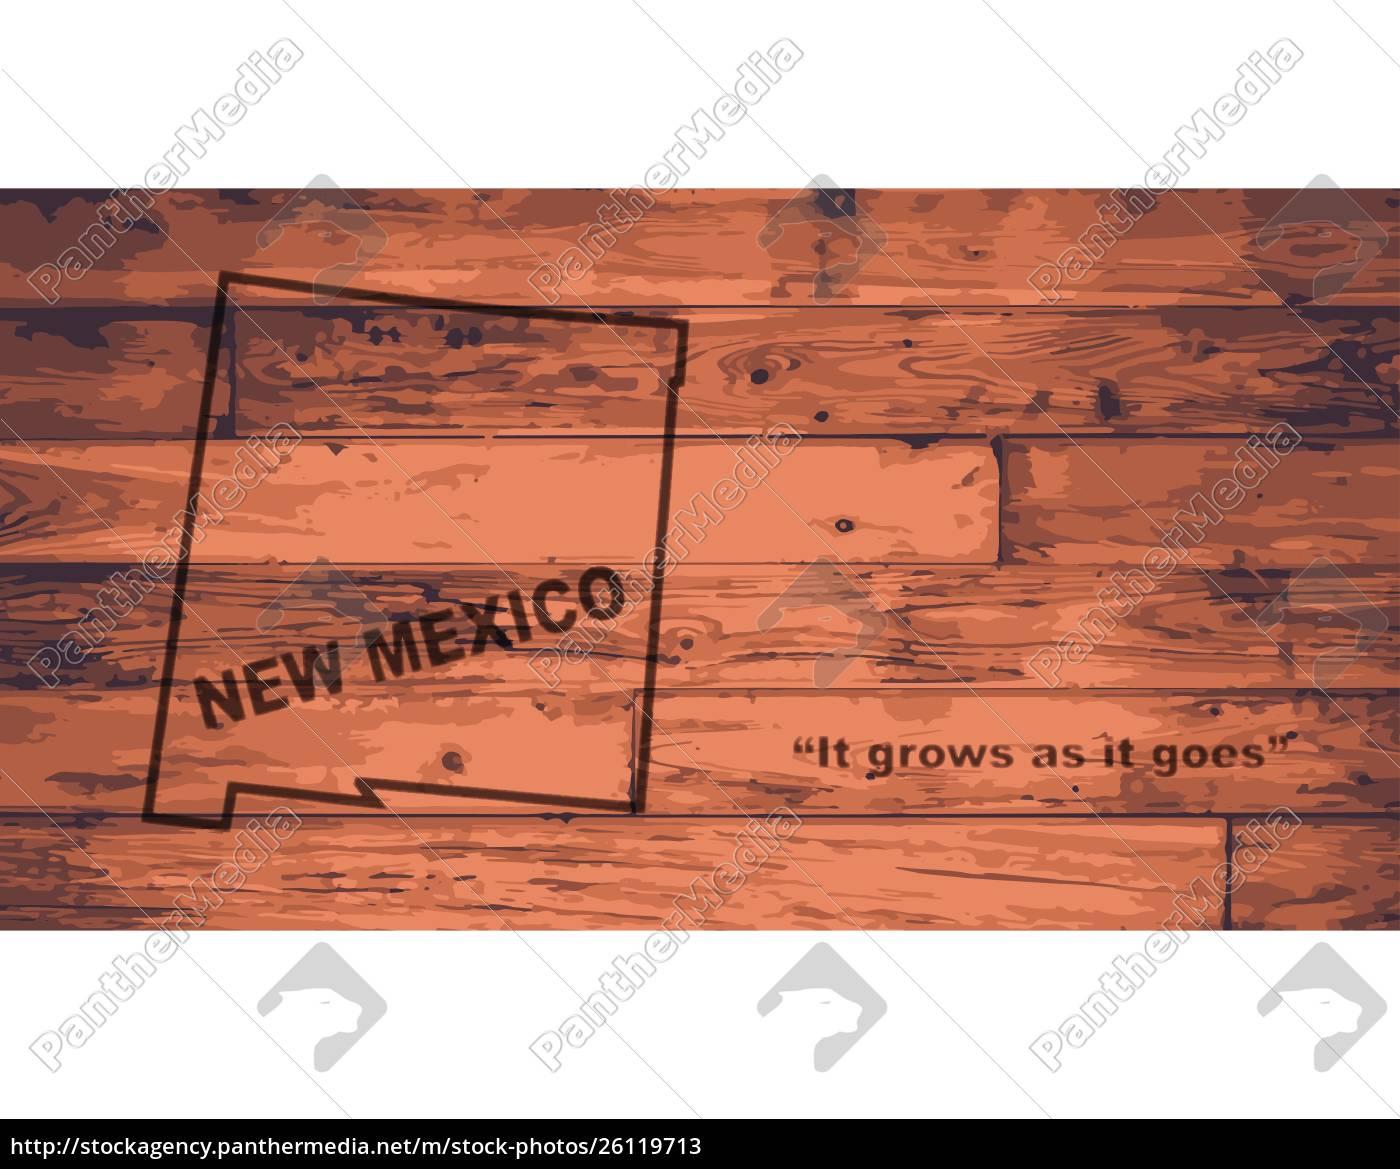 Kort Maerke For New Mexico Stockphoto 26119713 Panthermedia